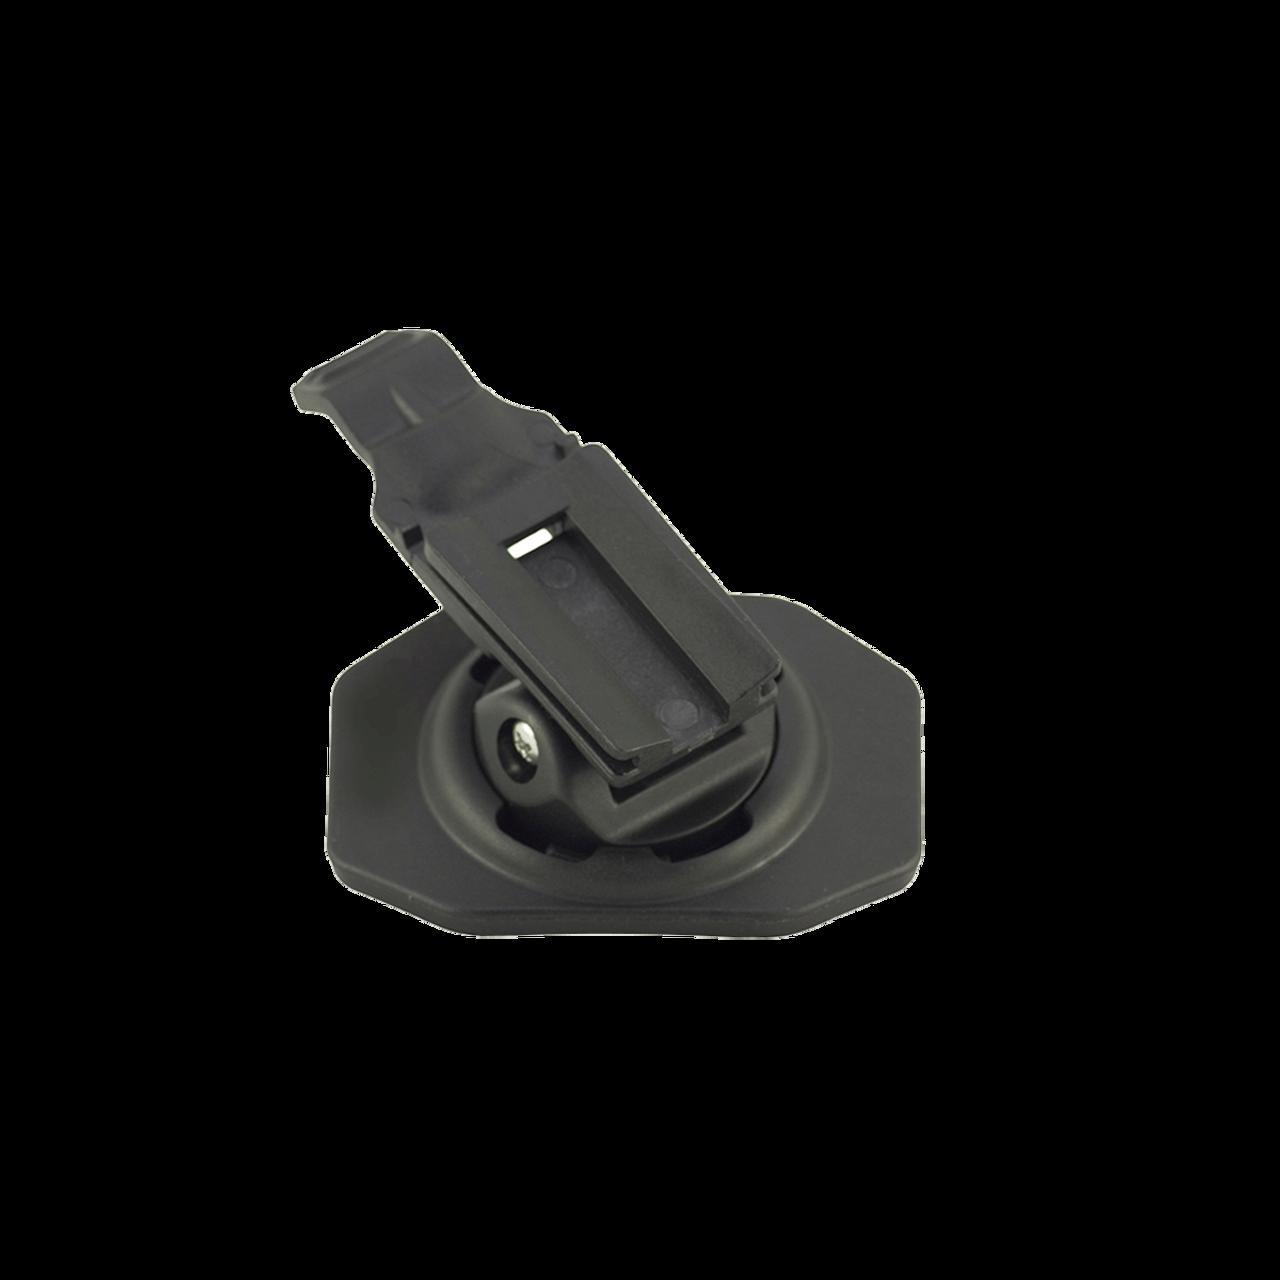 Niterider Helmet Stick-On Pivot Mount Bracket